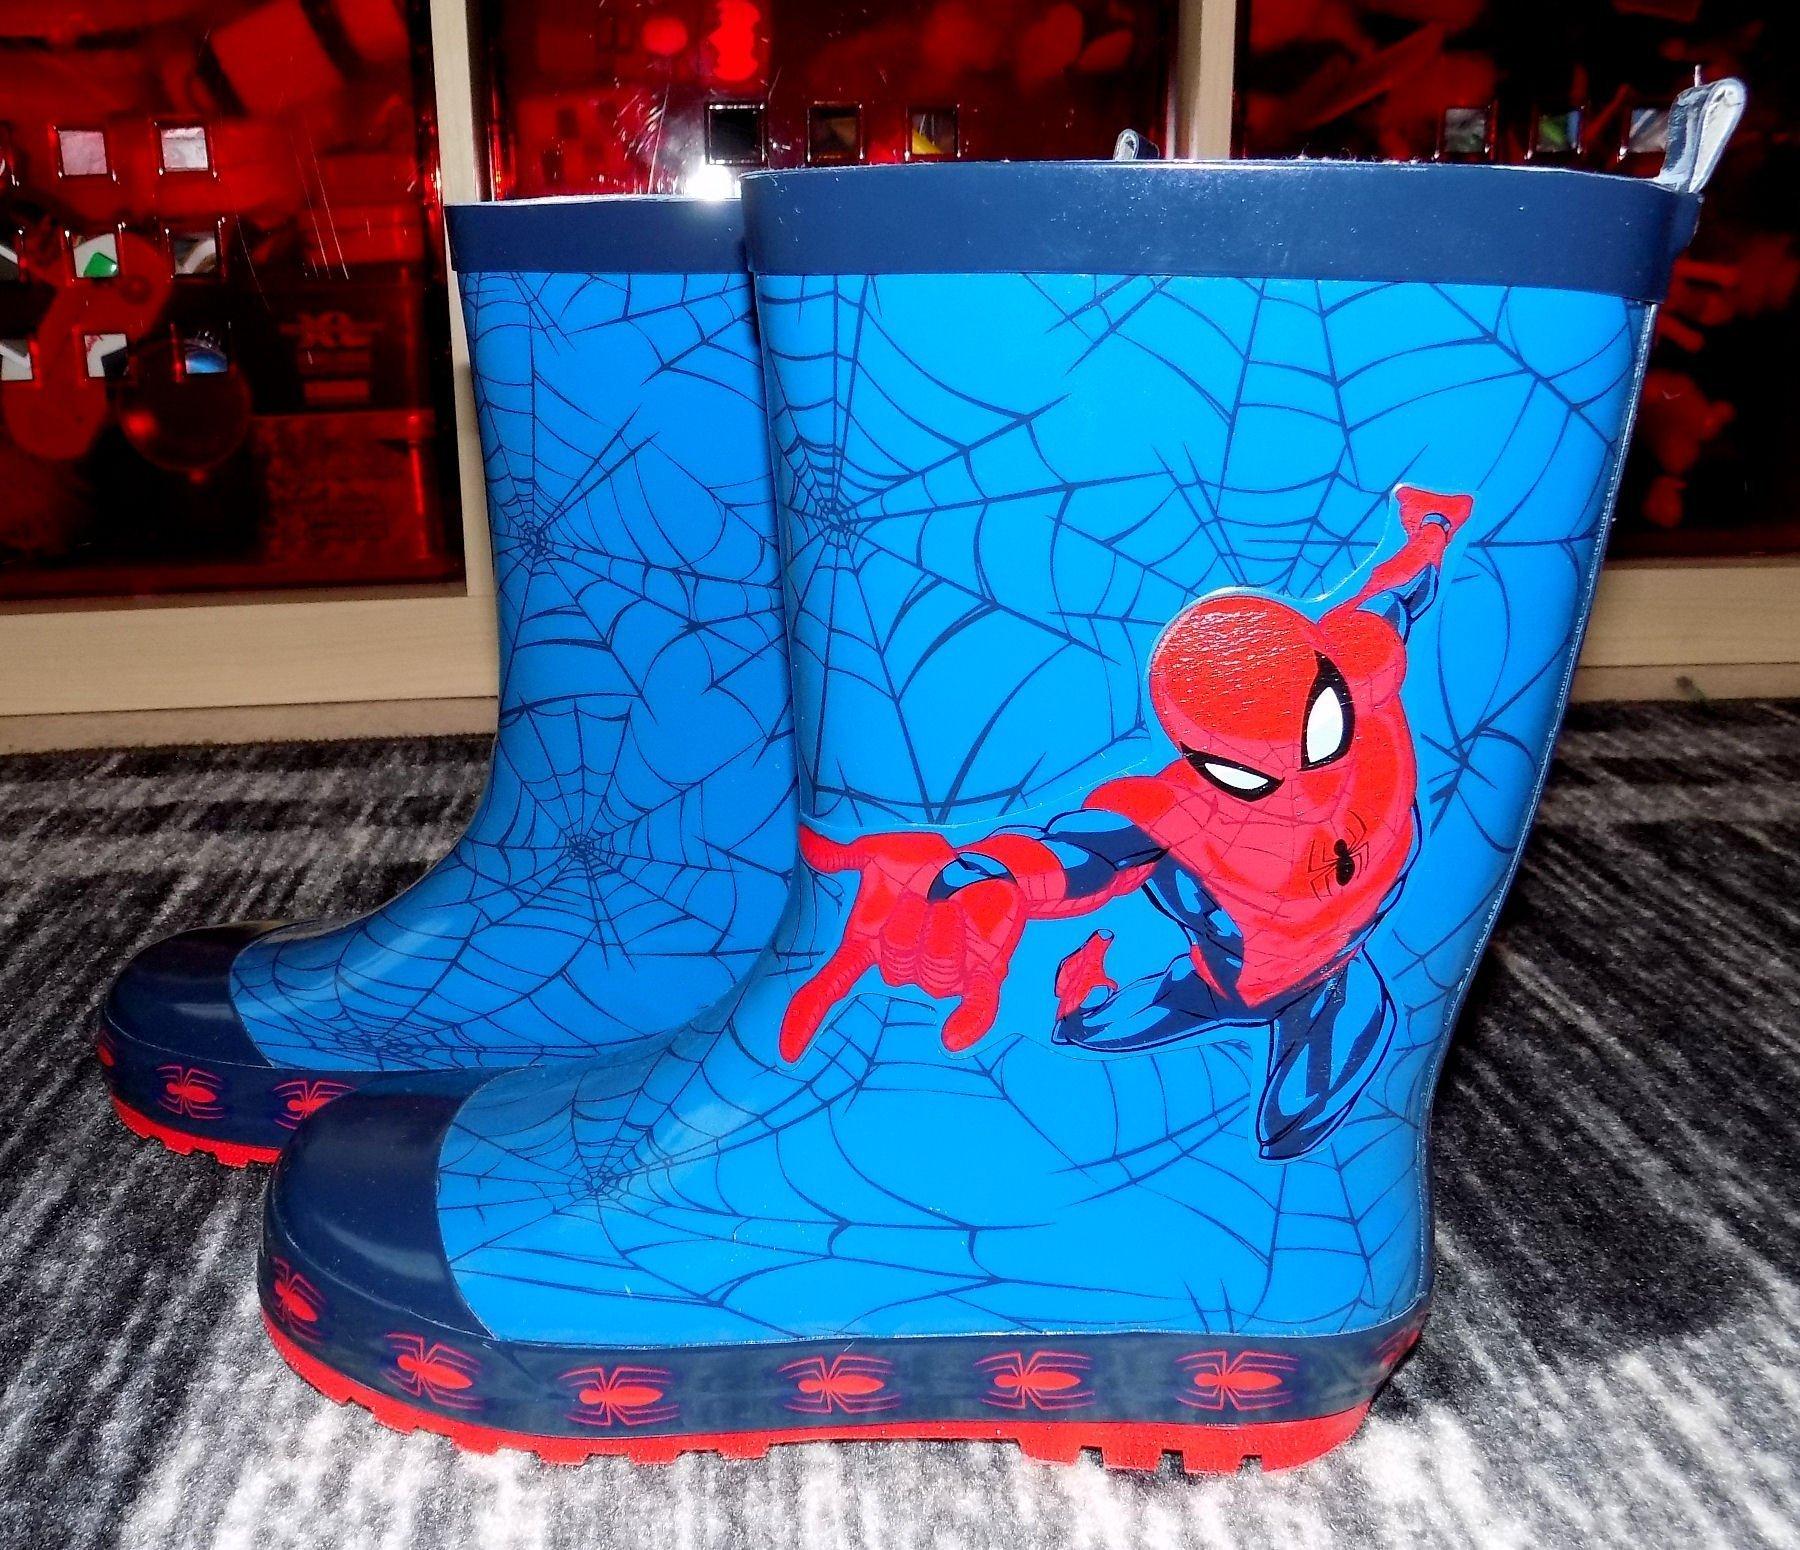 Nya! Jättefina gummistövlar Spiderman Spindelmannen strl 32 (innermått 20,8)